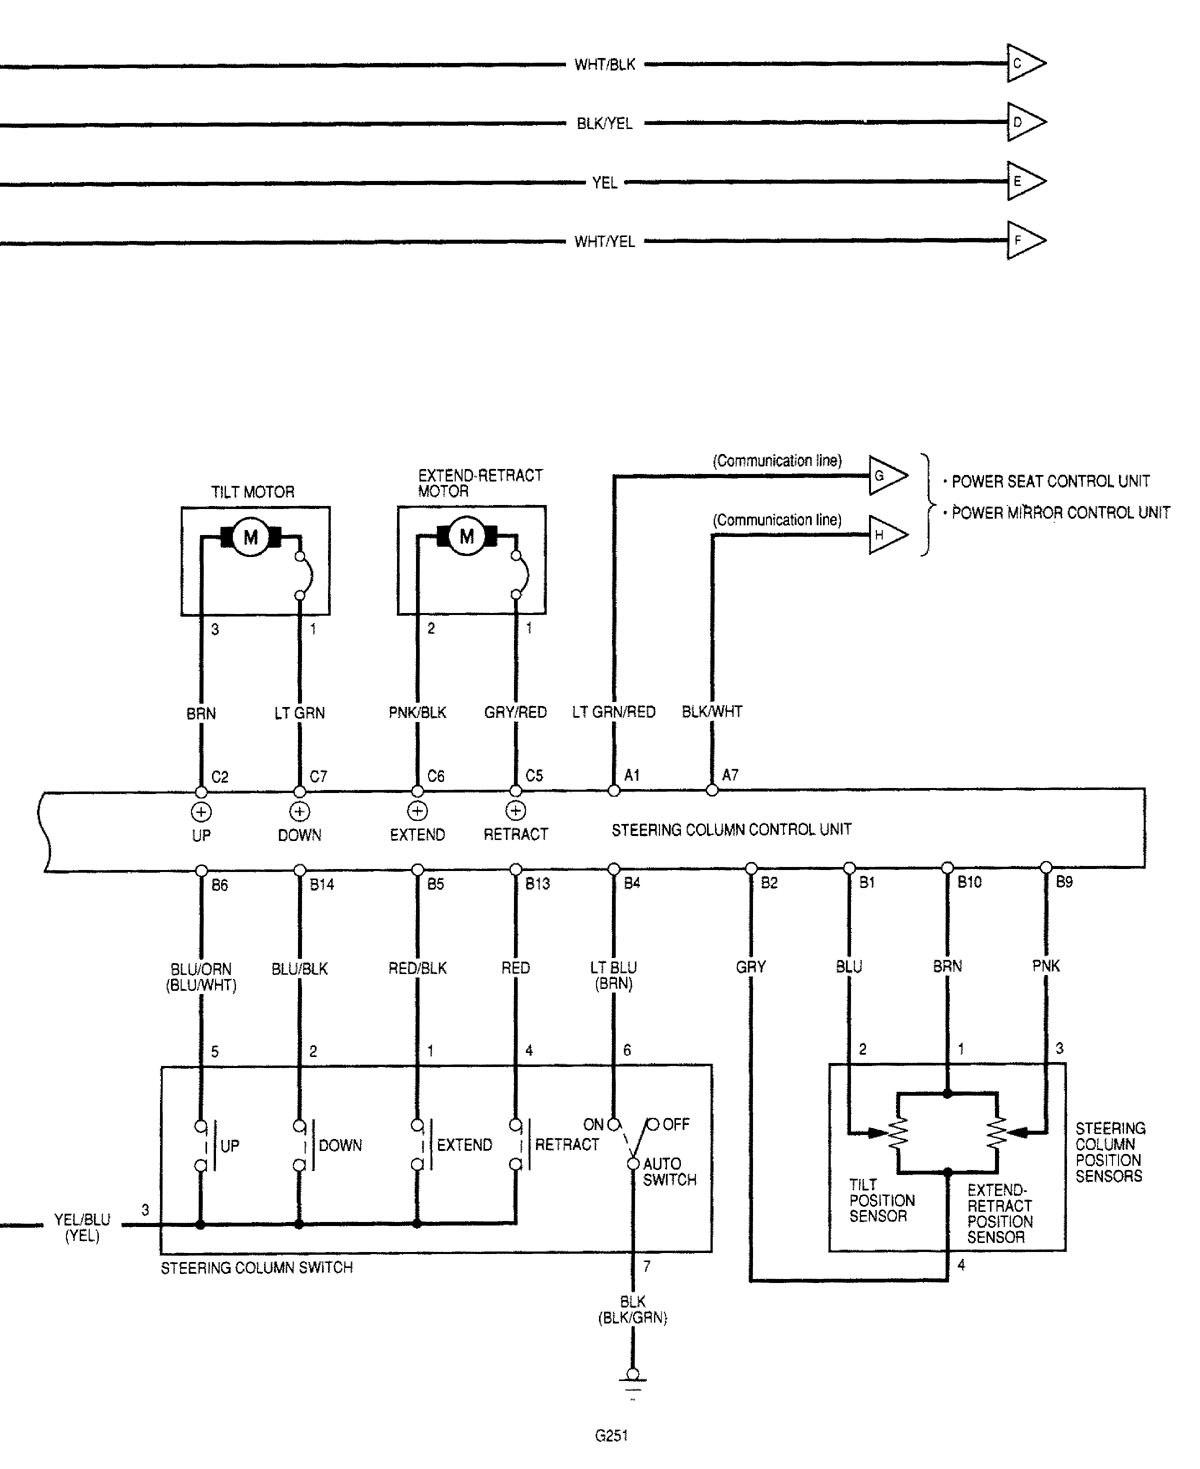 Acura Rl  2000 - 2002  - Wiring Diagrams